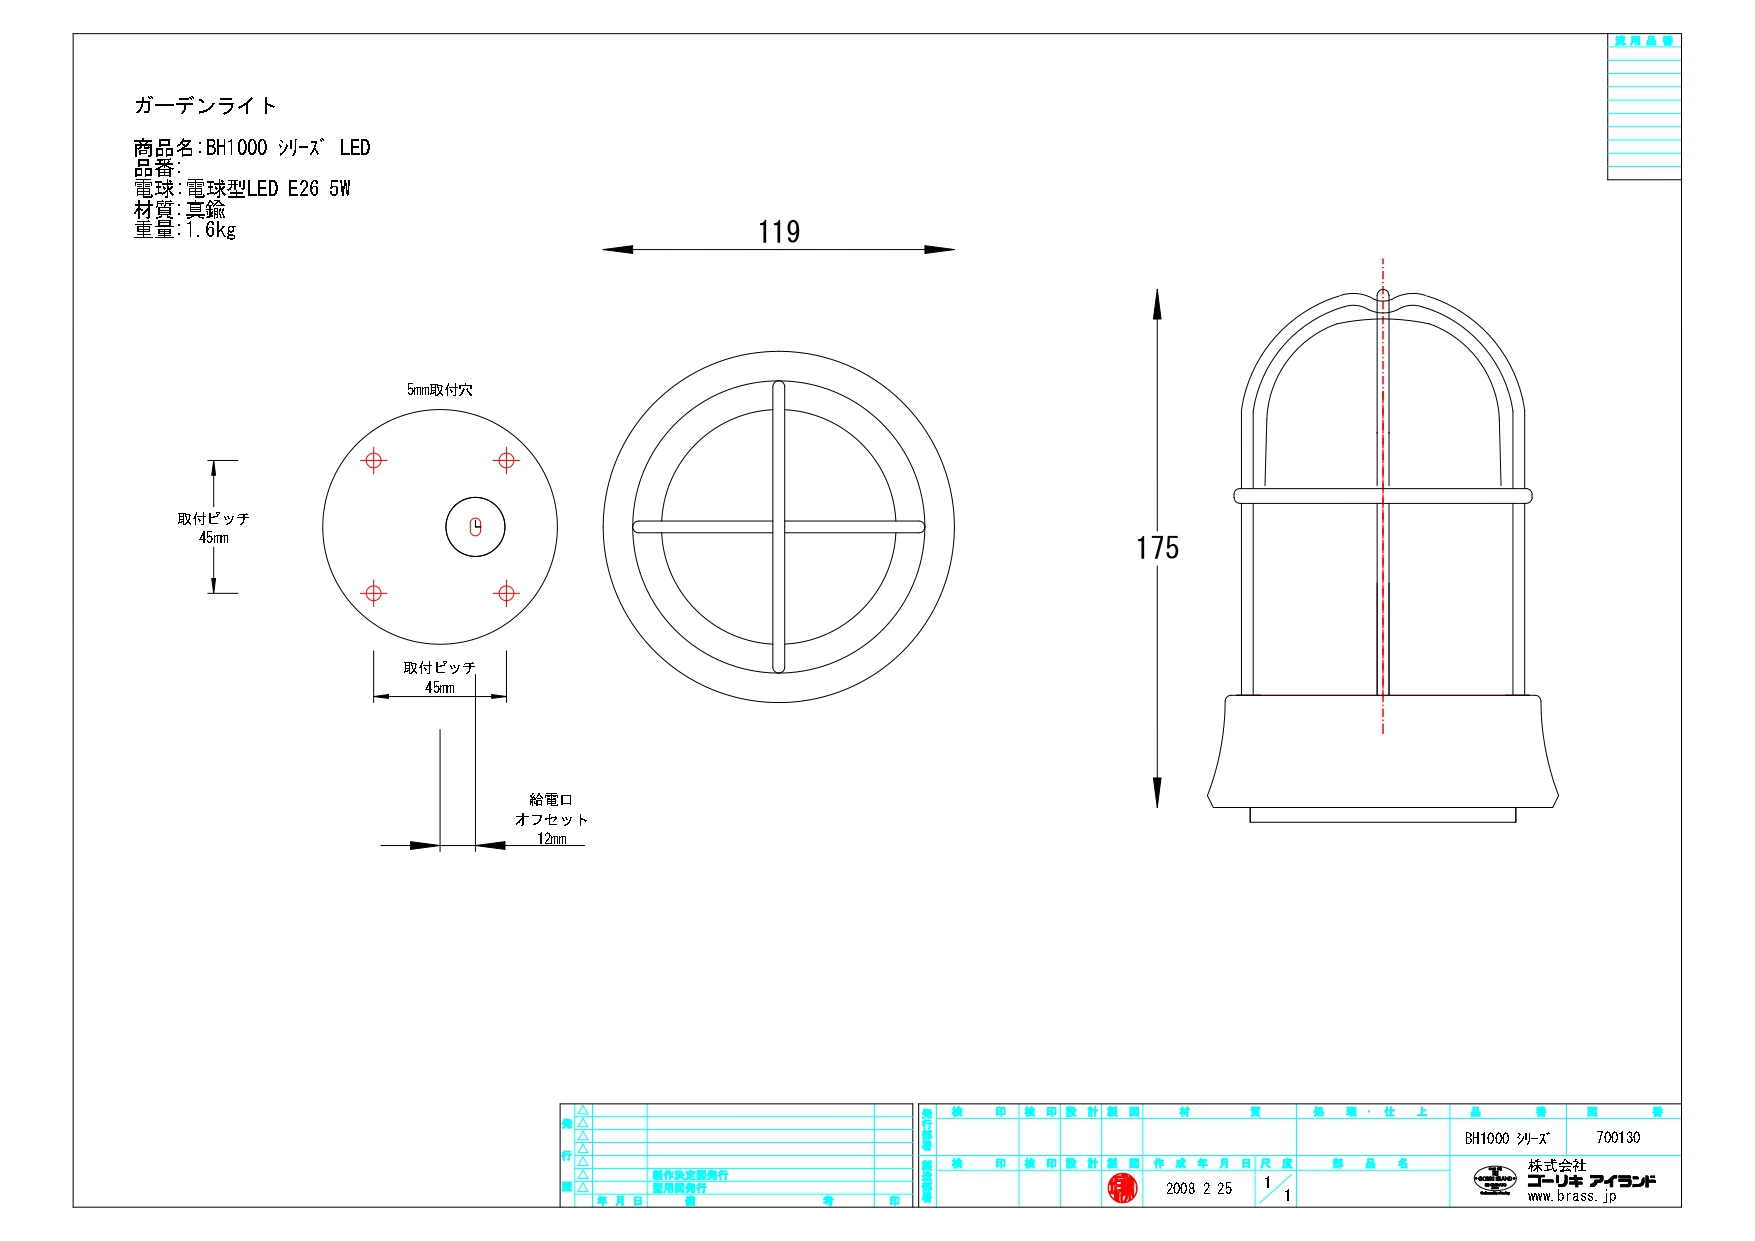 BH1000 BK Chips 施工説明書_page-0002